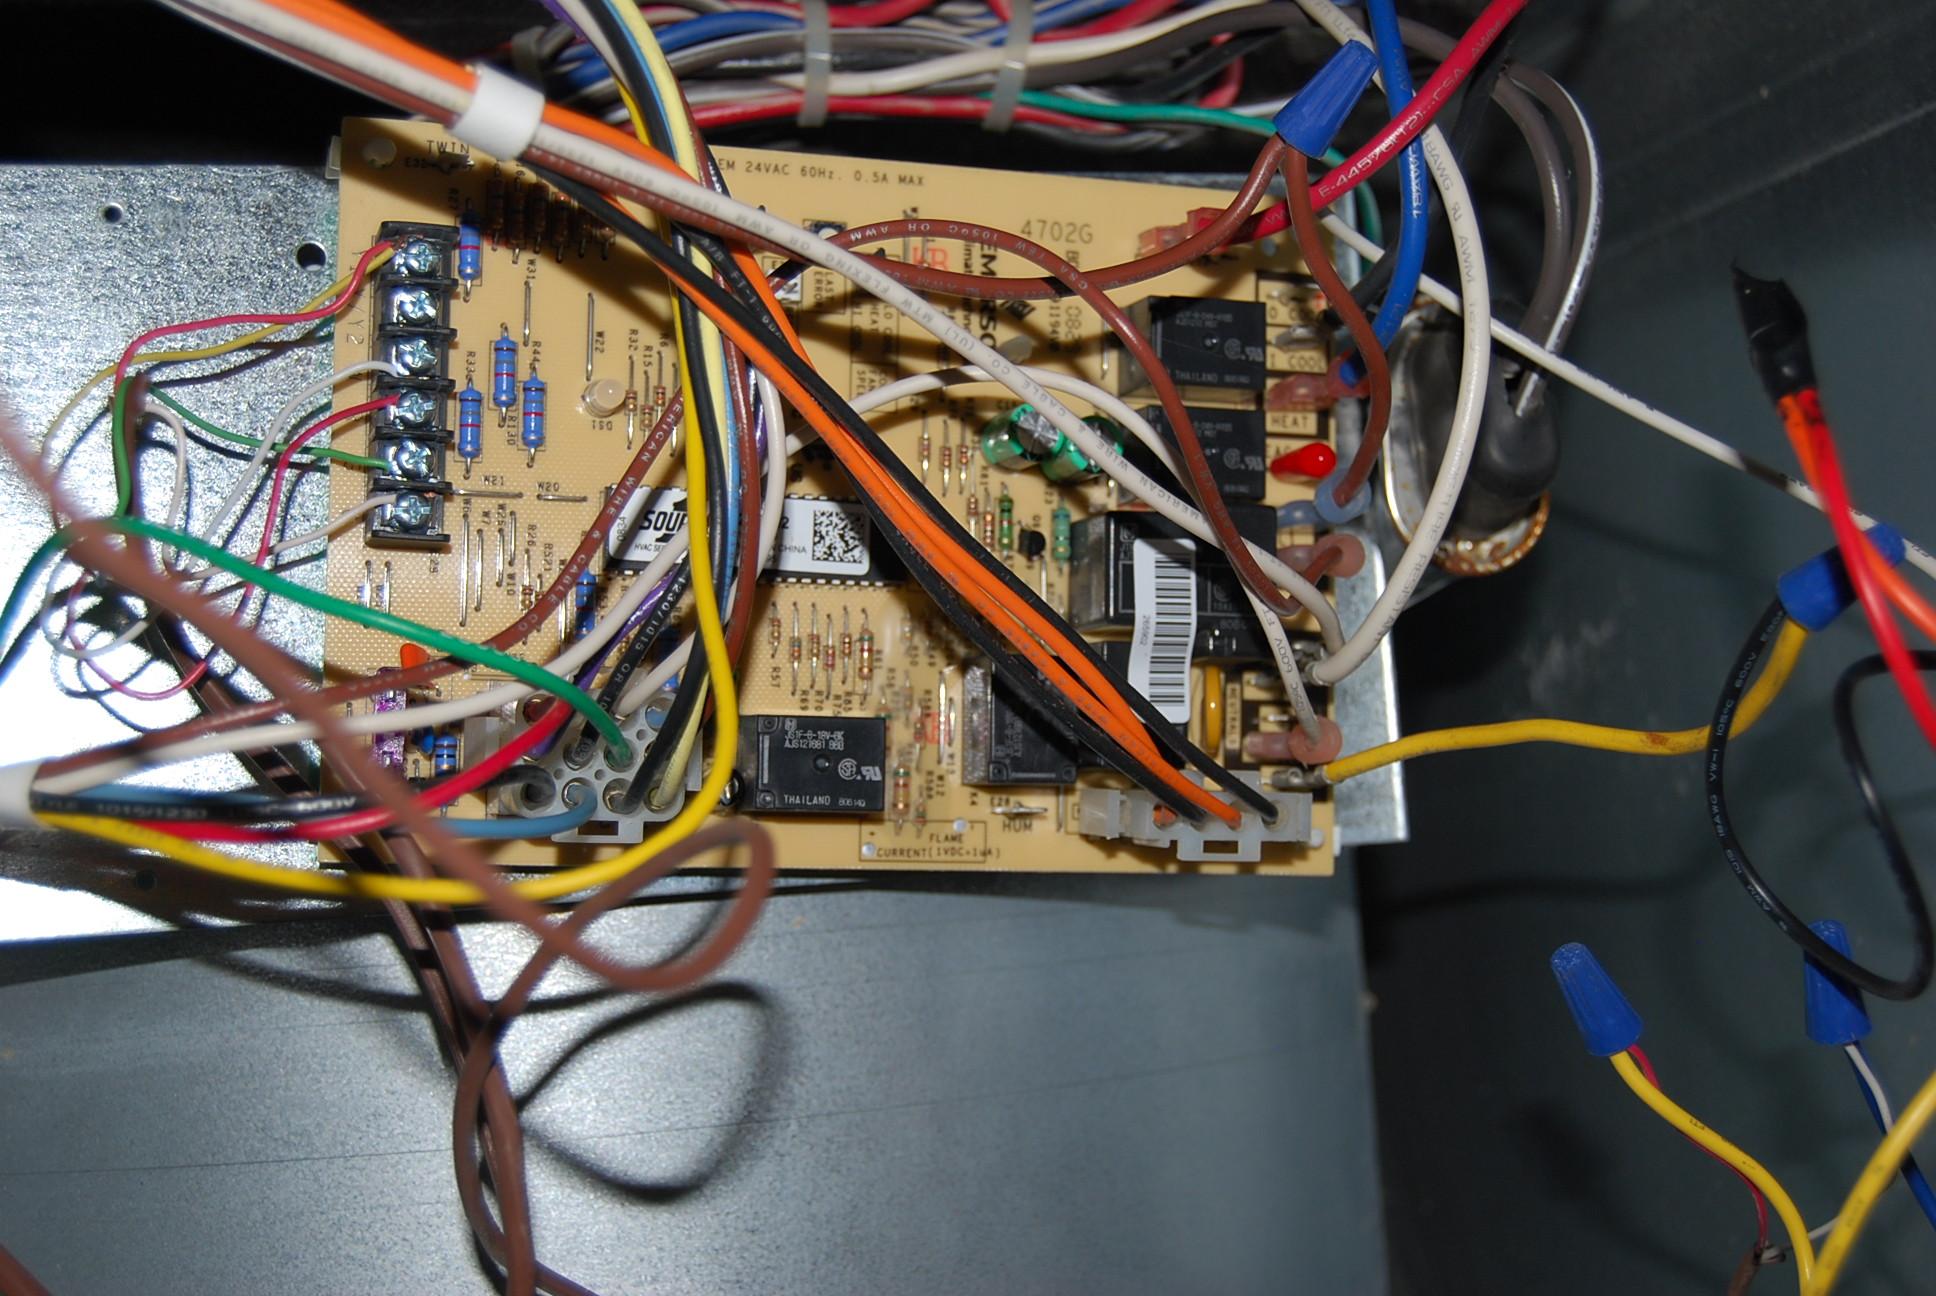 hight resolution of 2010 05 26 224311 dsc 0218 york furnace wiring diagram the wiring diagram readingrat net york diamond 80 wiring